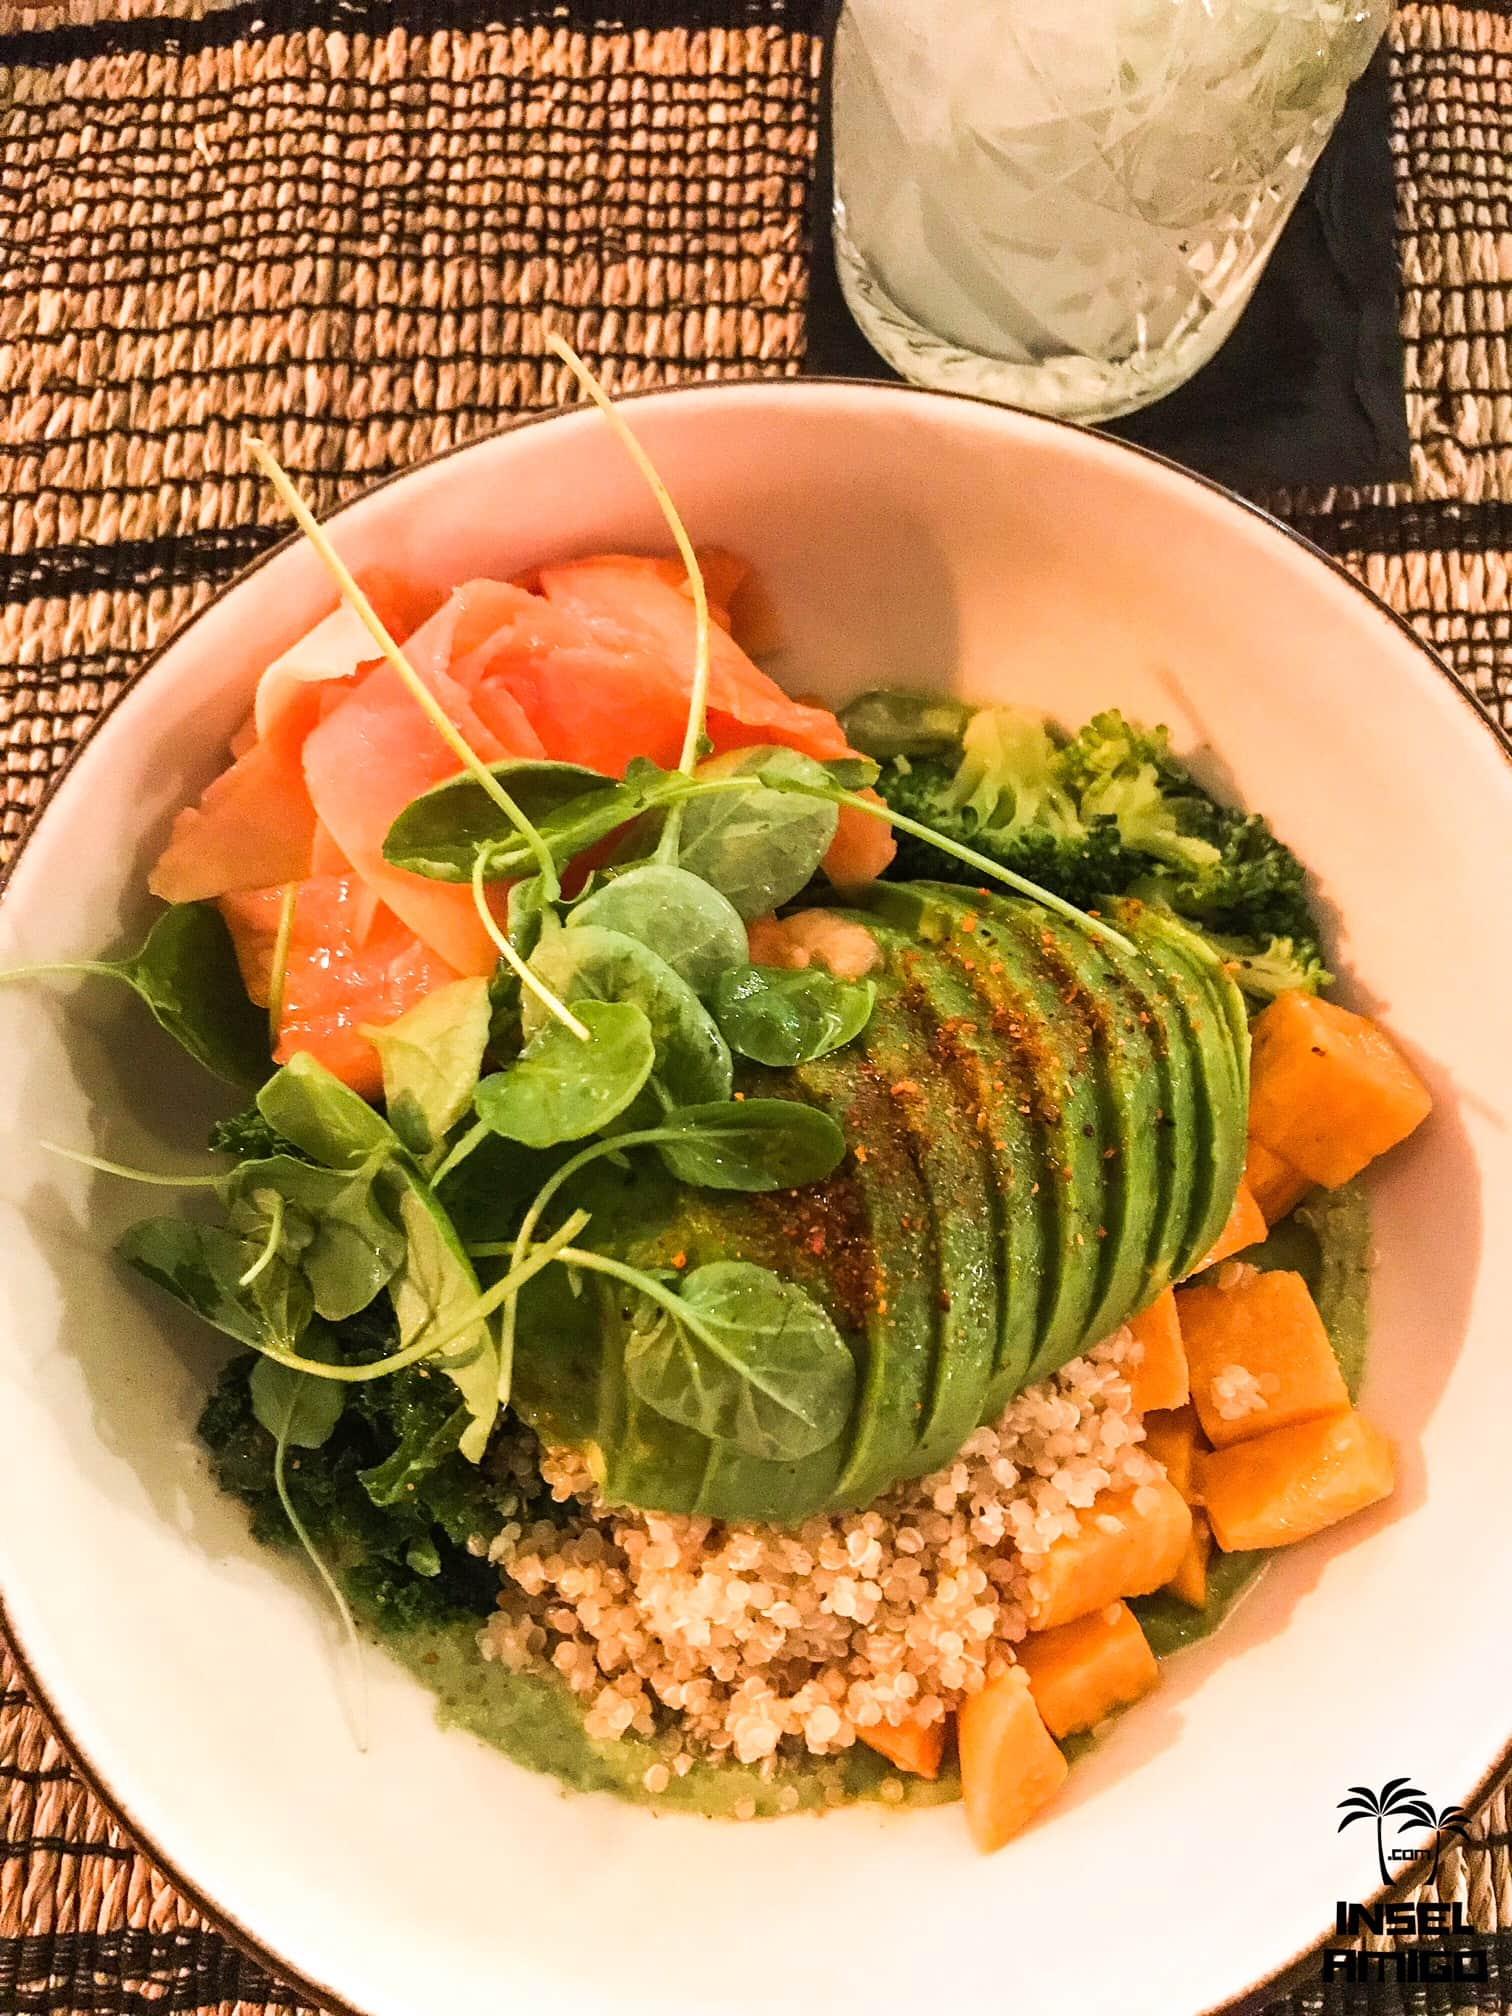 Ronny's Green Super Food Bowl